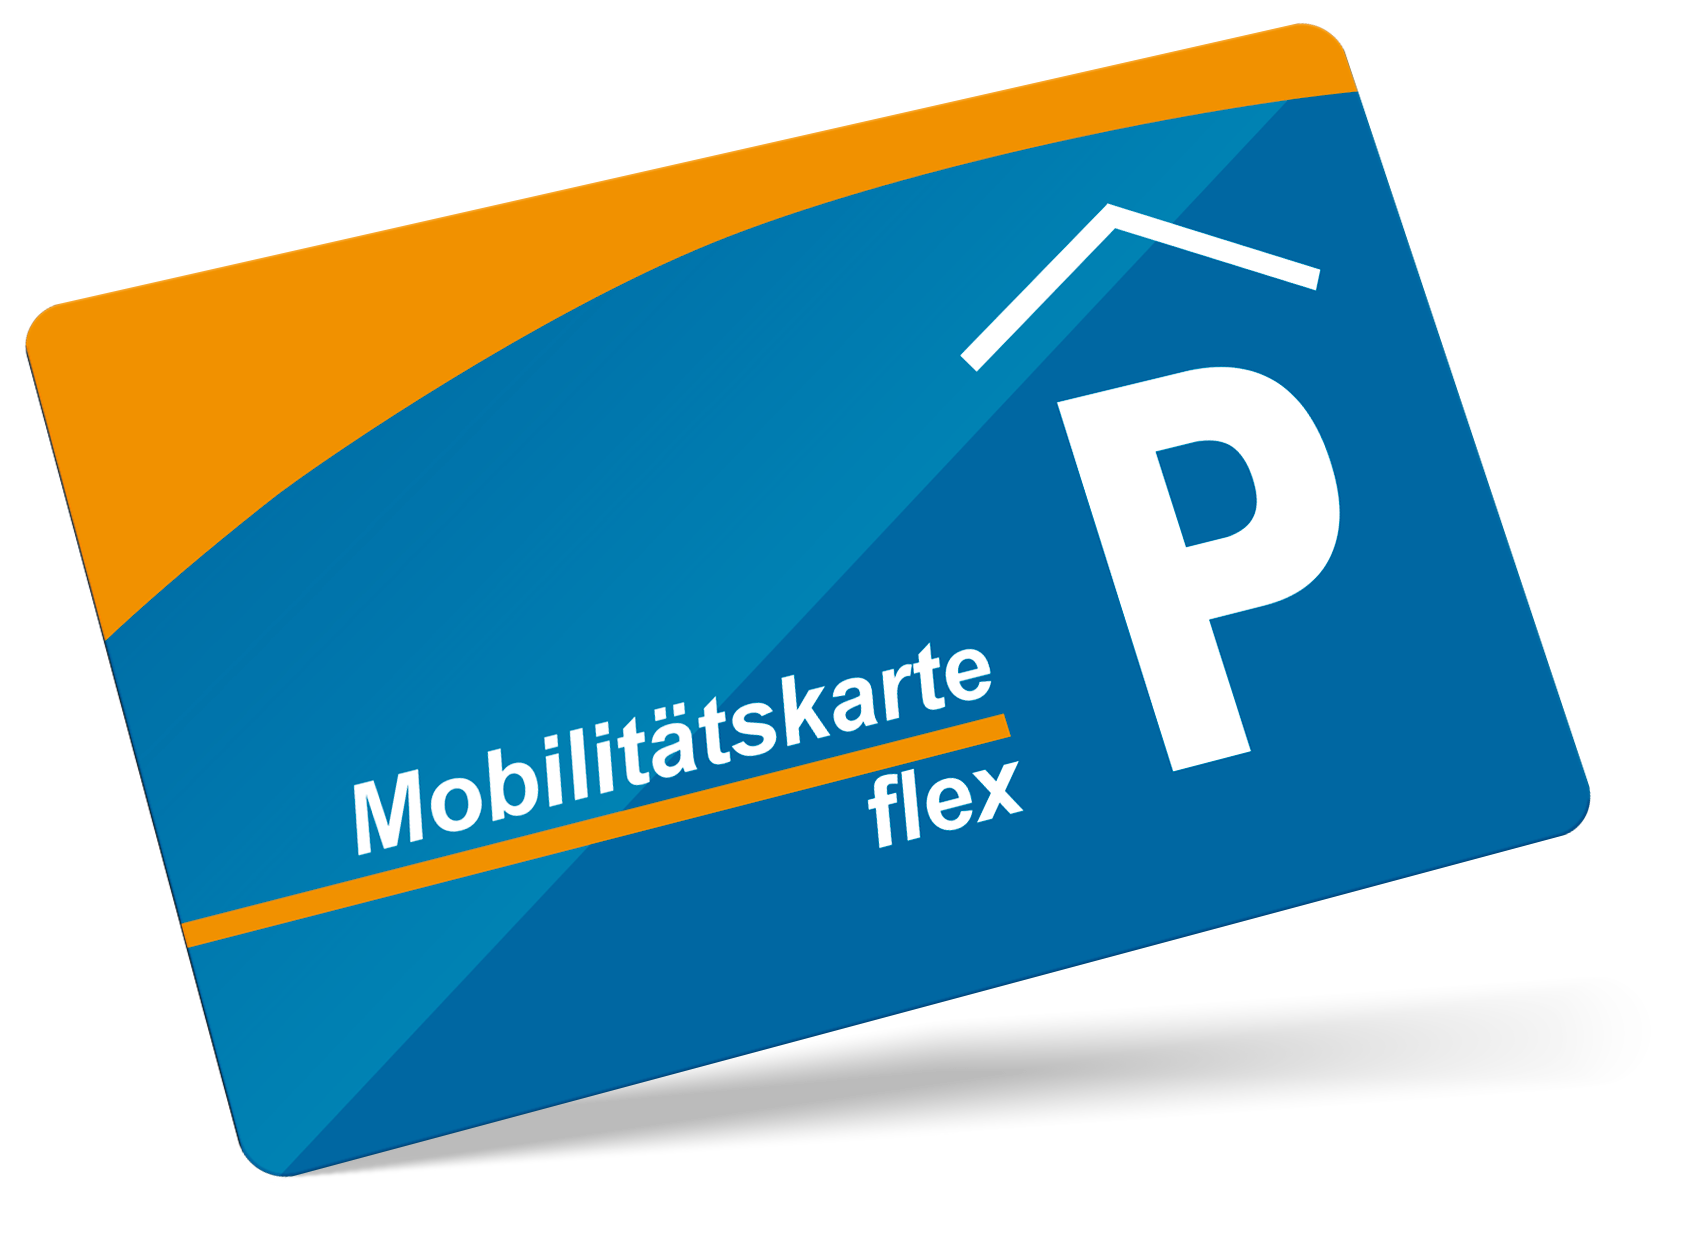 MOBILITÄTSKARTE FLEX